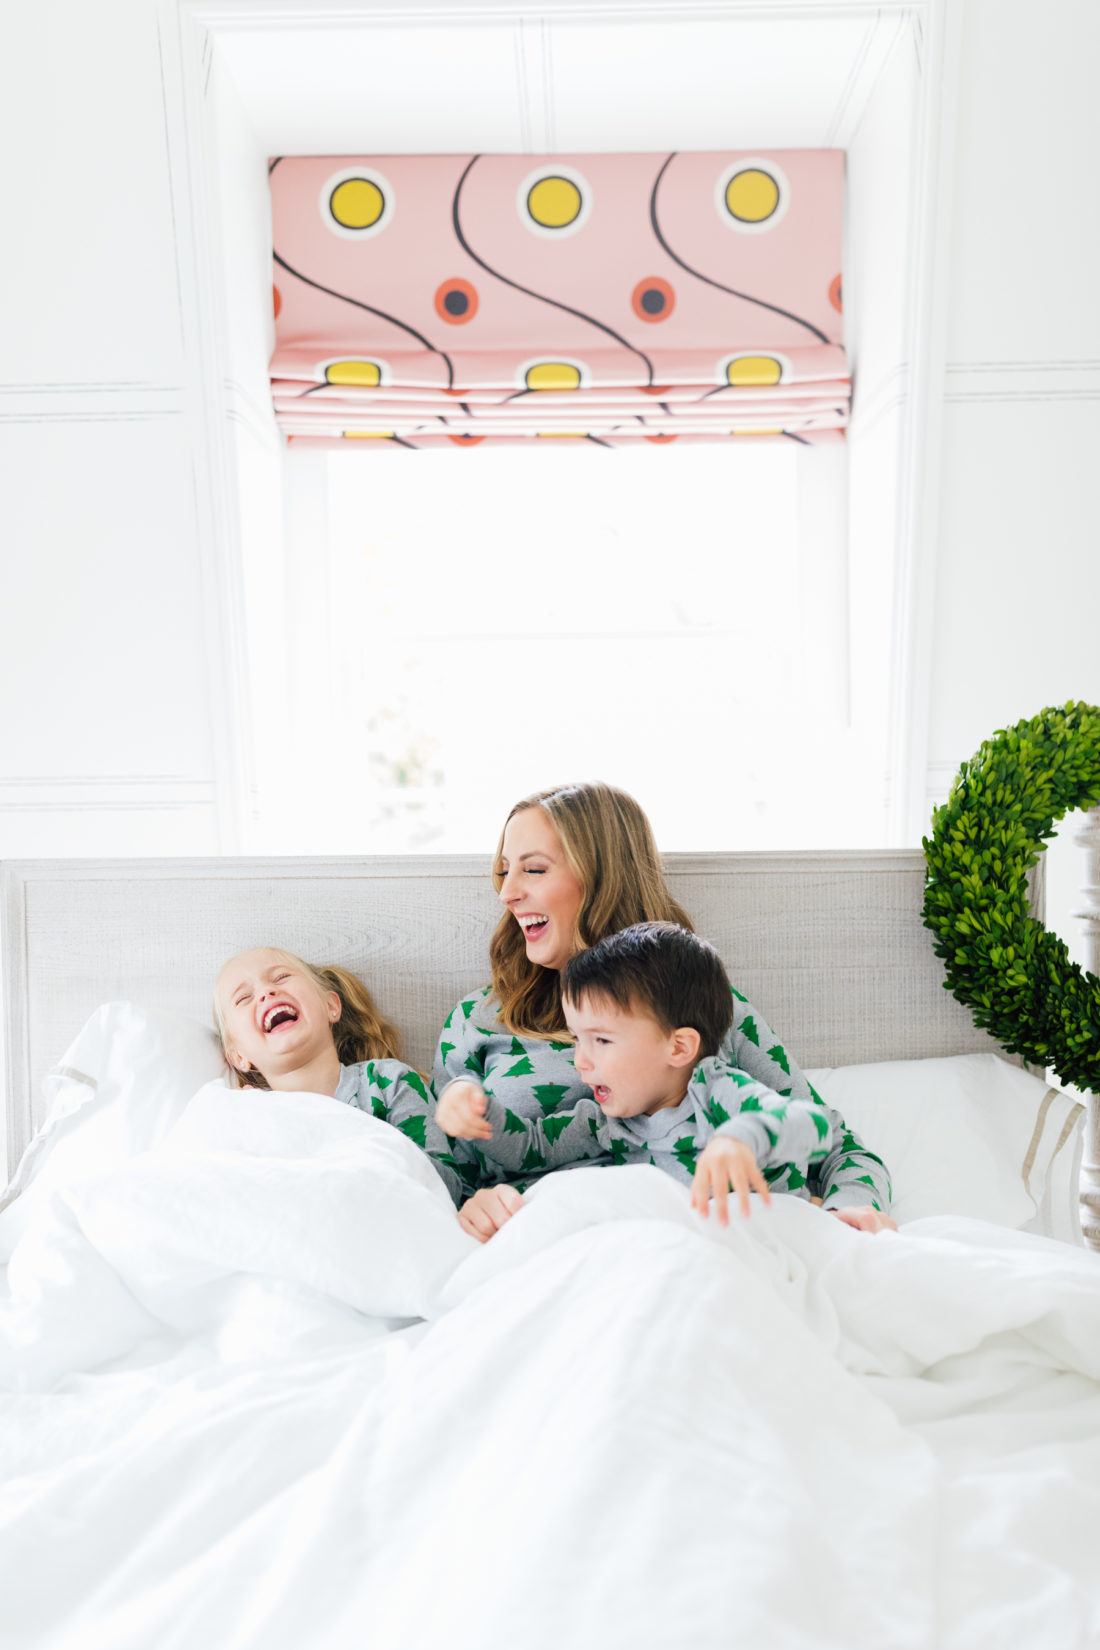 Eva Amurri Martino cuddles with her kids in bed wearing matching holiday pajamas